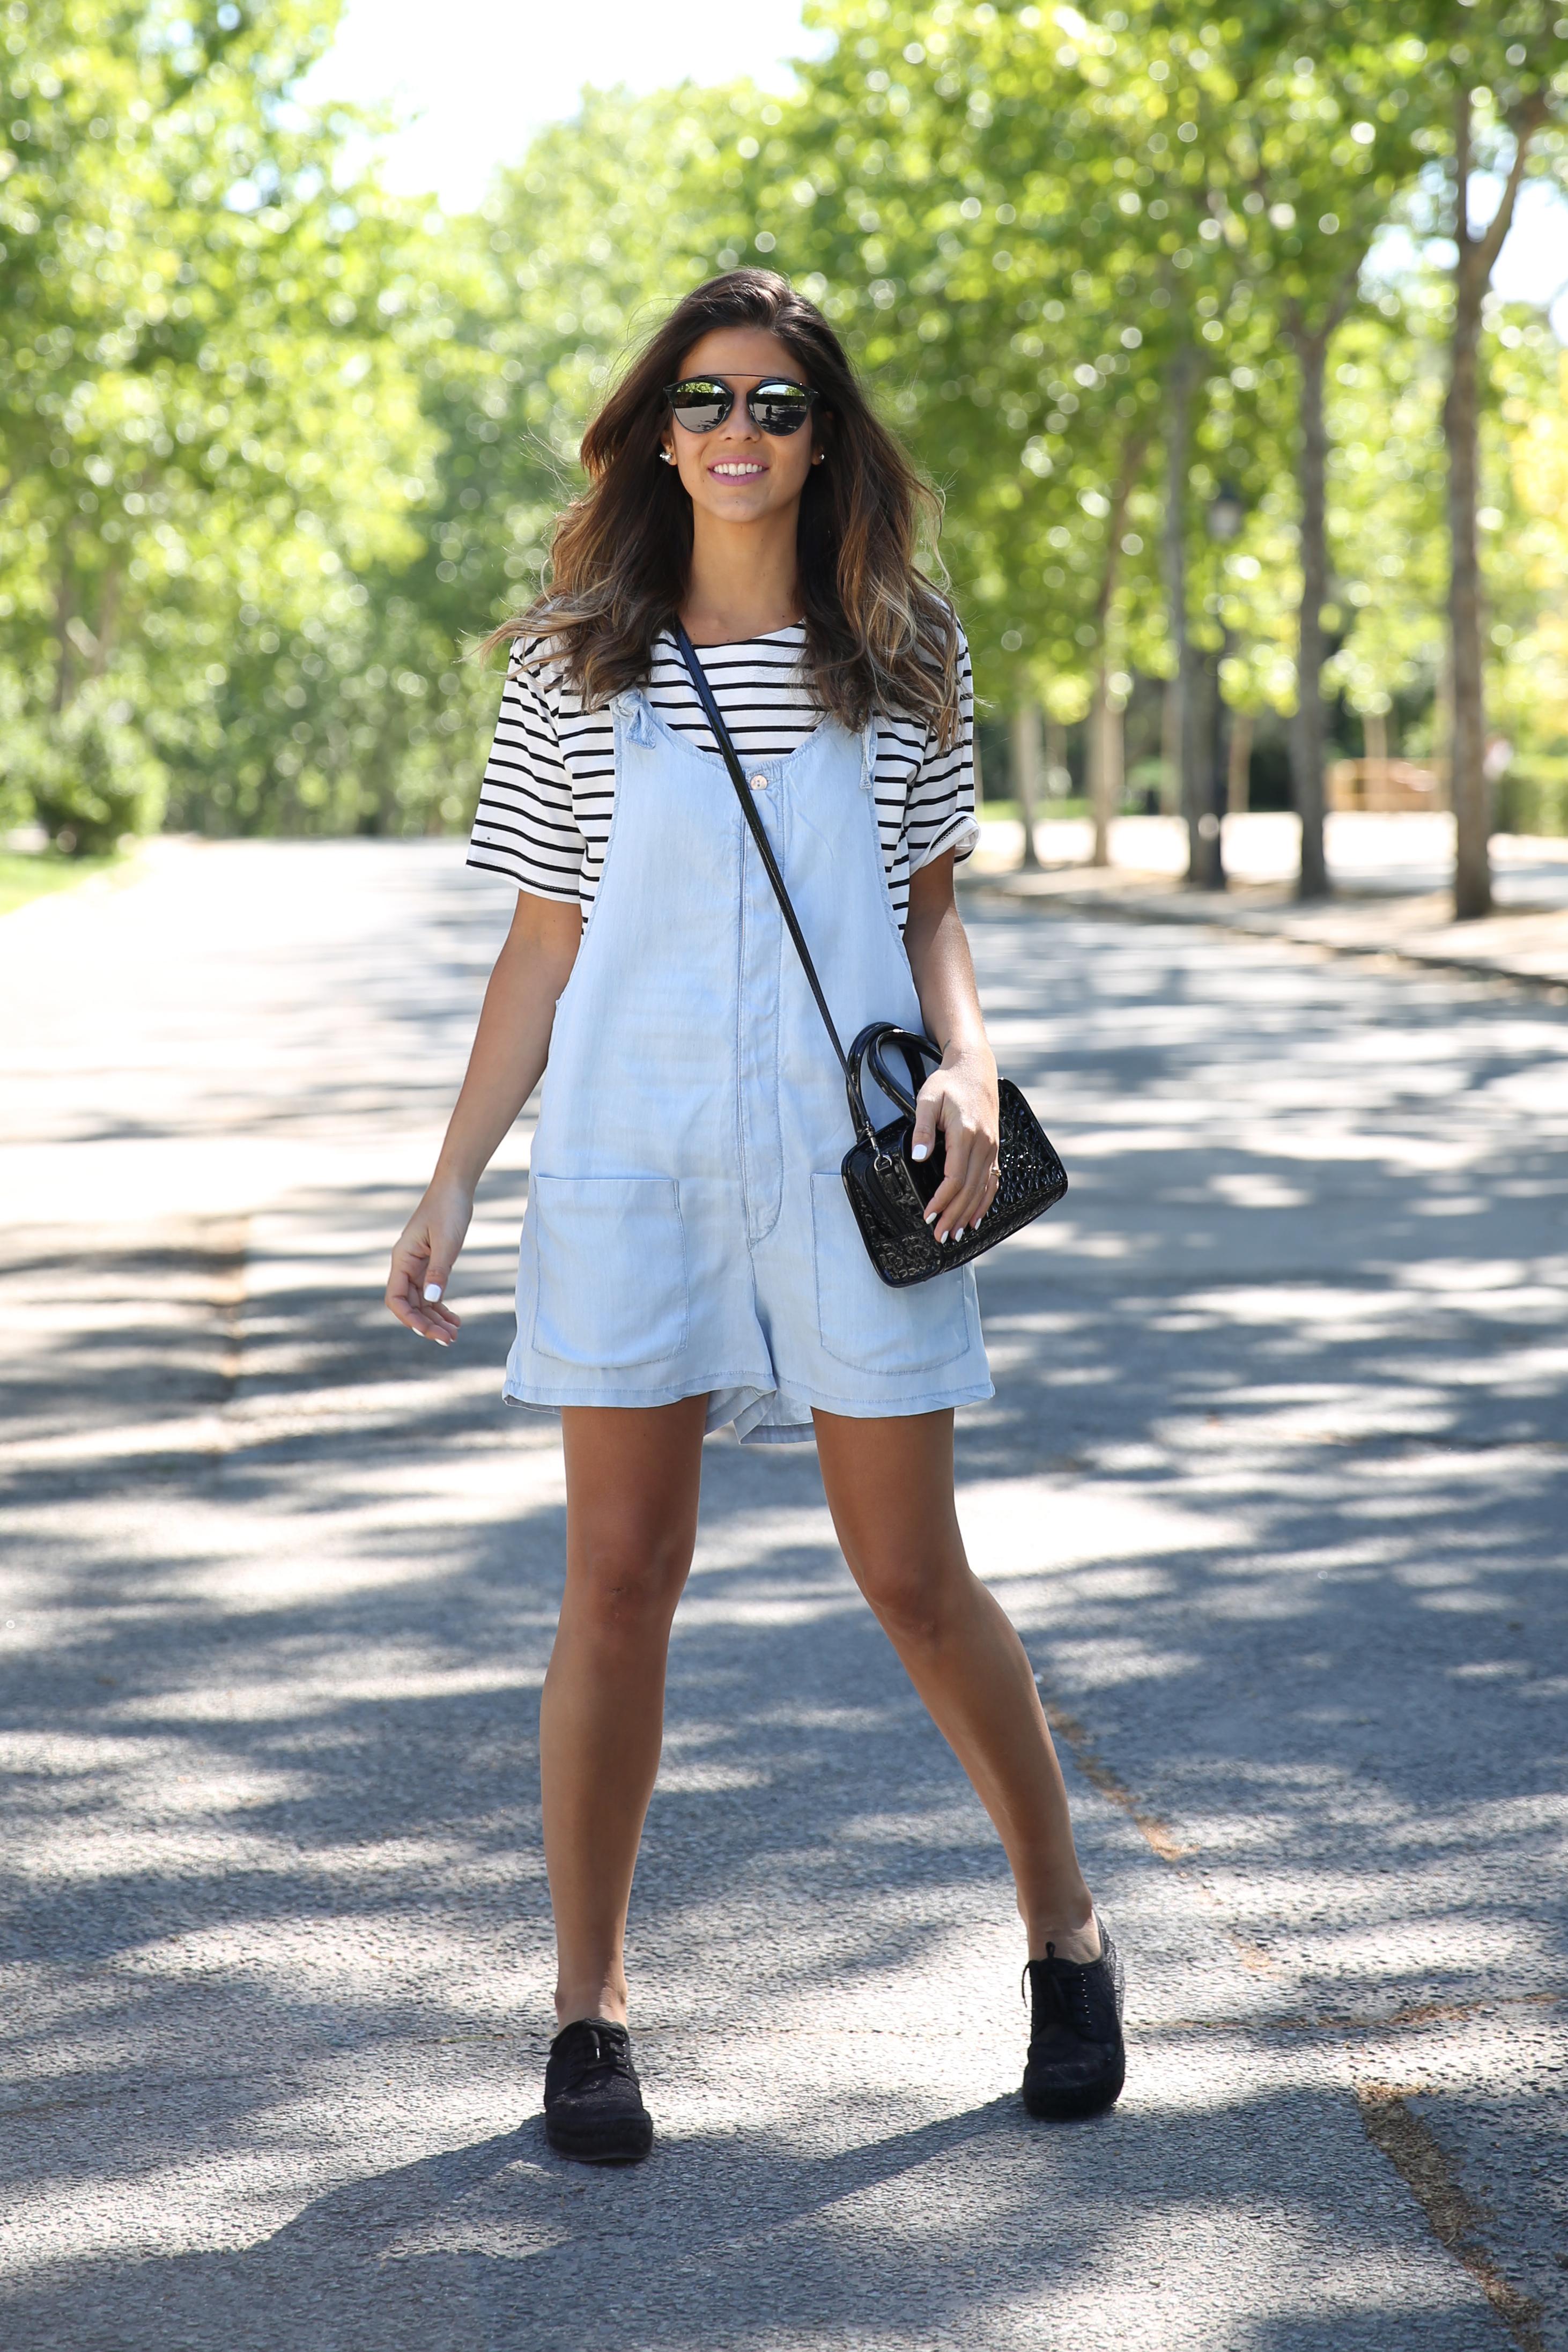 trendy_taste-look-outfit-street_style-ootd-blog-blogger-fashion_spain-vaquero_claro-peto_vaquero-tirantes-striped_tee-camiseta_rayas-marinero-dior_sunnies-gaimo-15